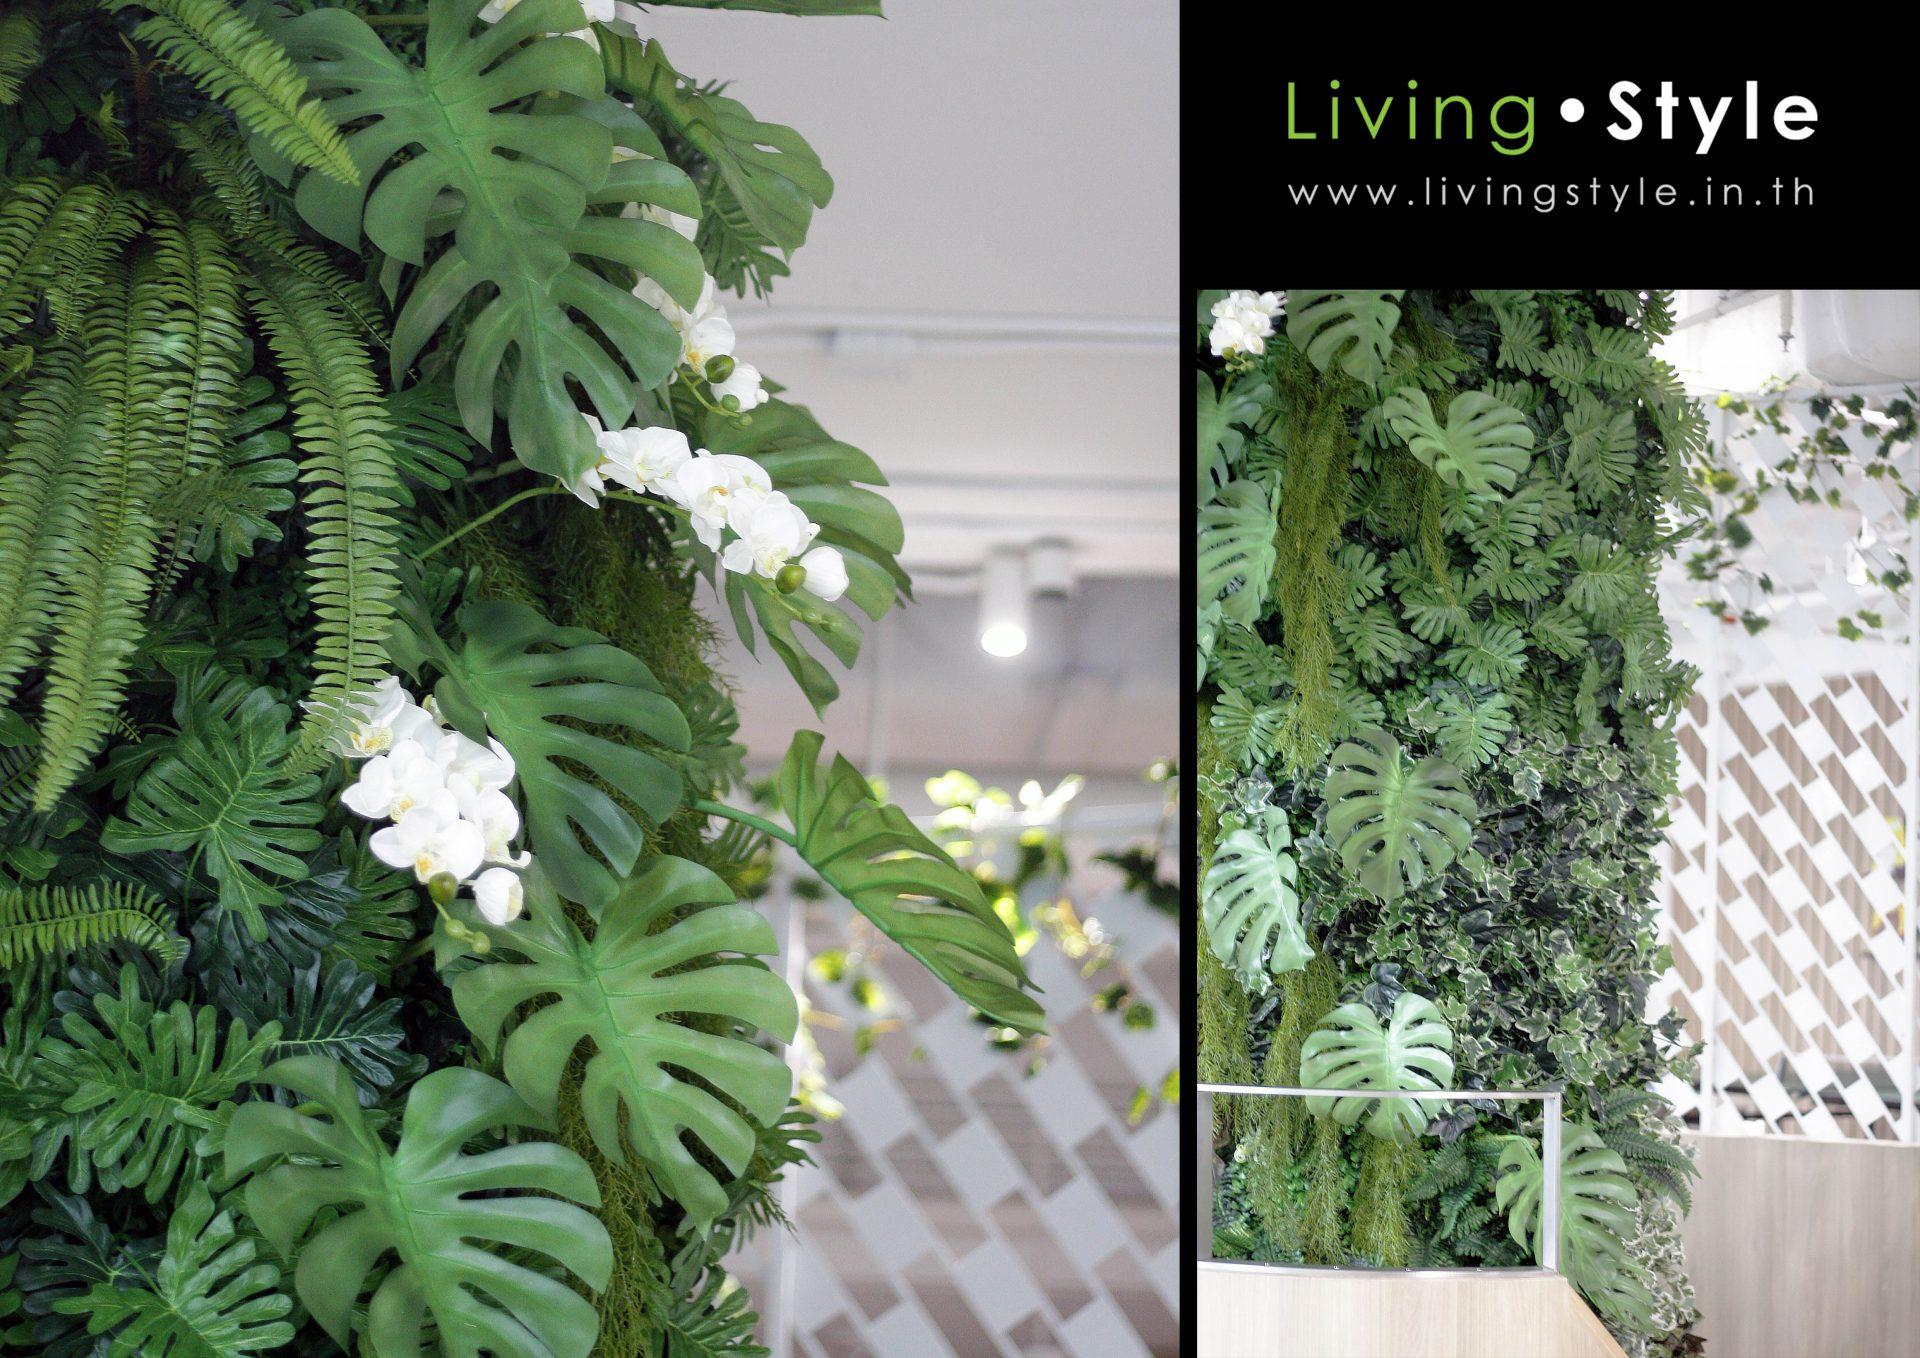 Livingstyle 020-1 catalog